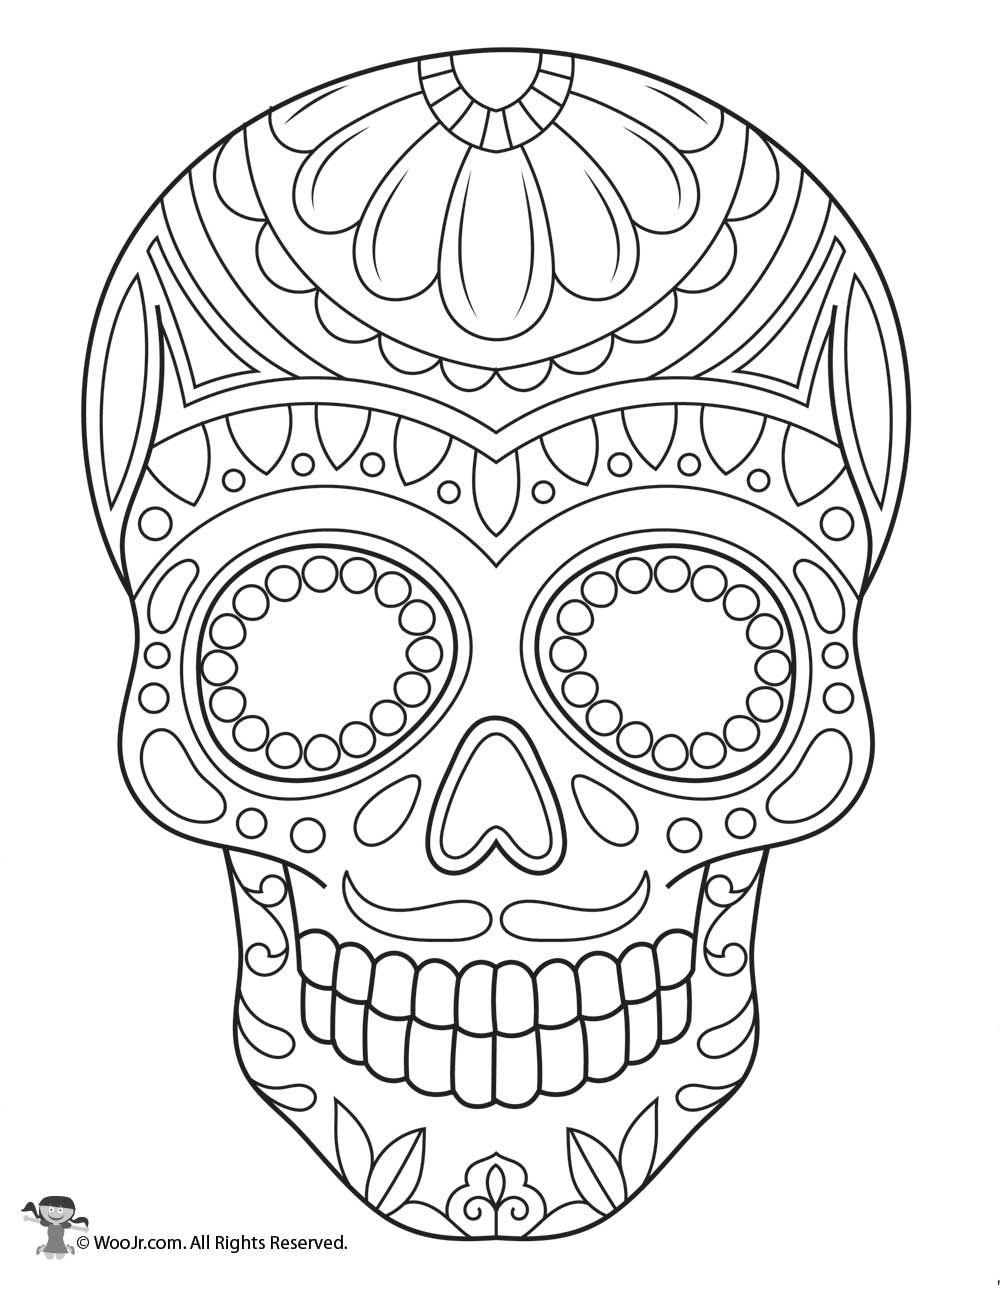 Sugar Skull Coloring Page Woo Jr Kids Activities In 2020 Skull Coloring Pages Sugar Skull Art Drawing Sugar Skull Artwork